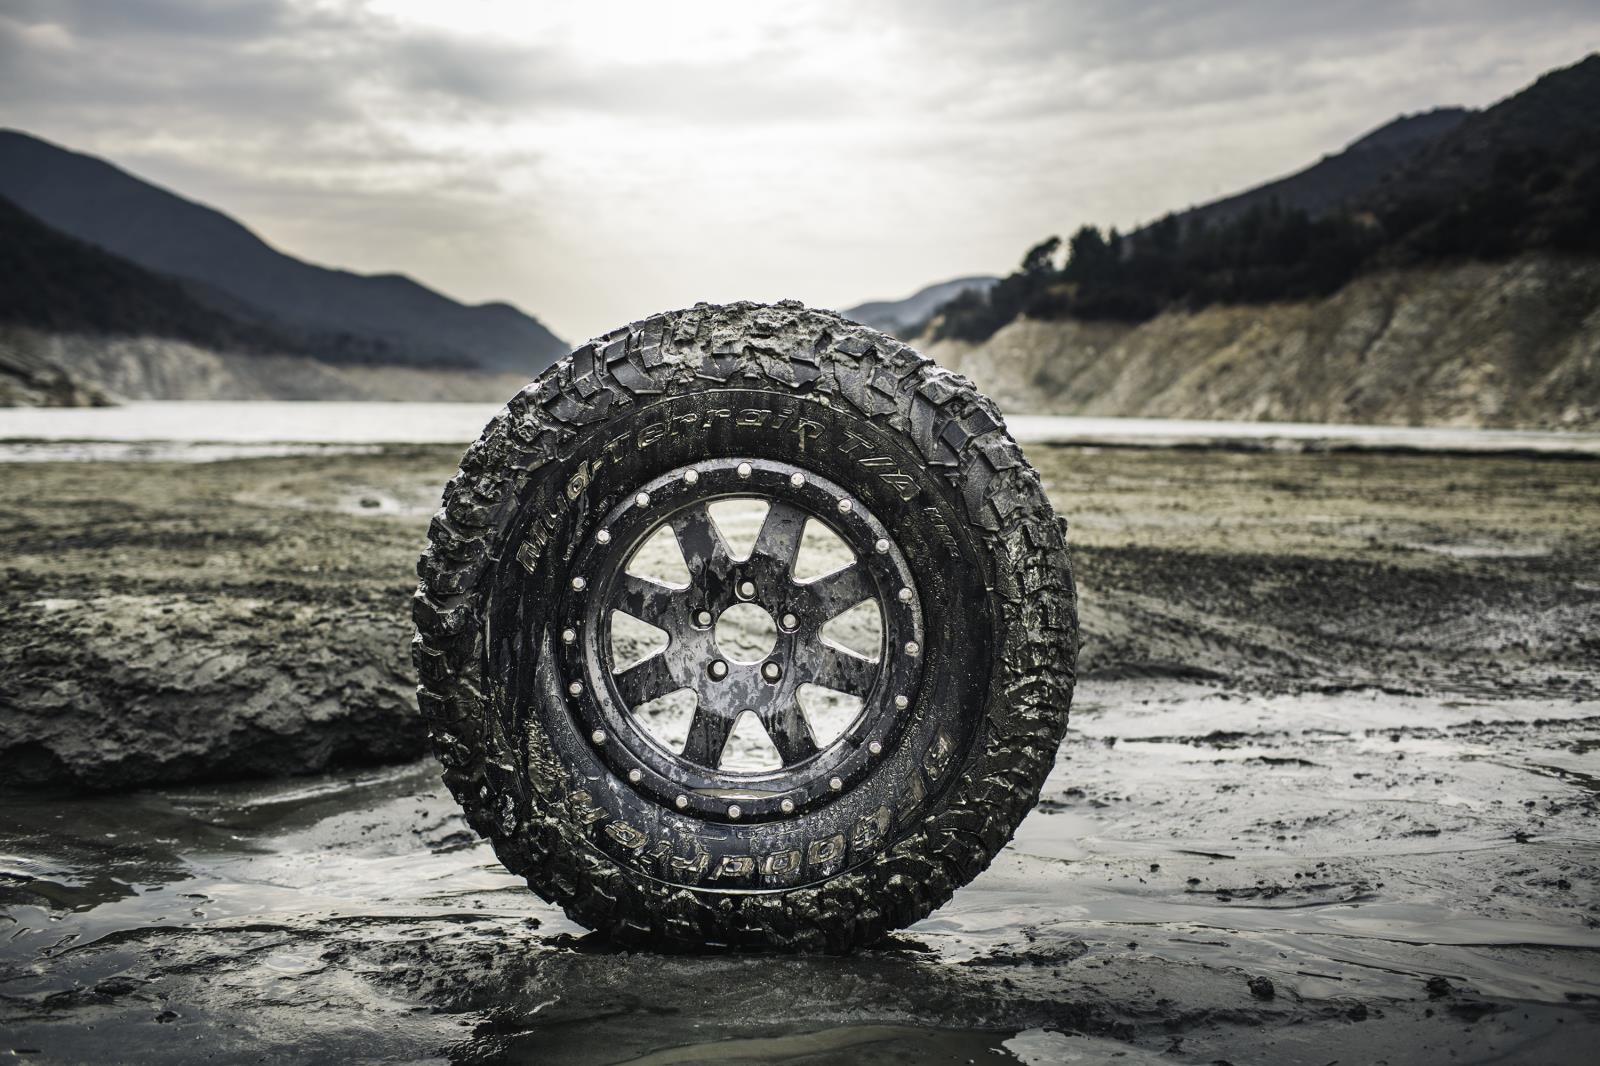 Bfgoodrich Launches Km3 Mud Tire Bfgoodrich North America Newsroom